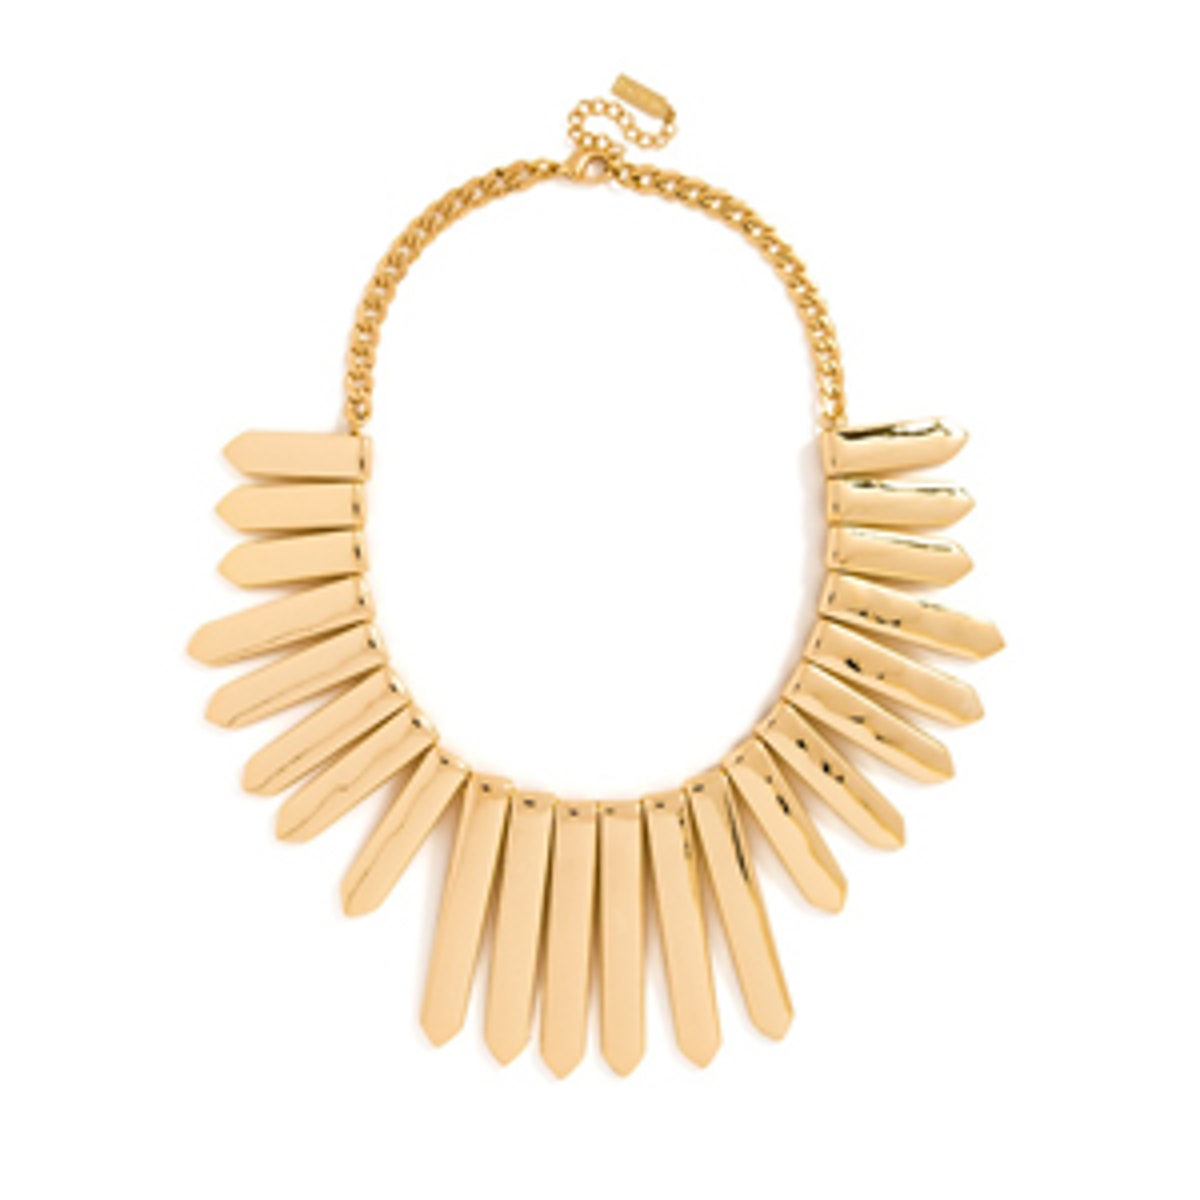 Gold Ra Bib Necklace